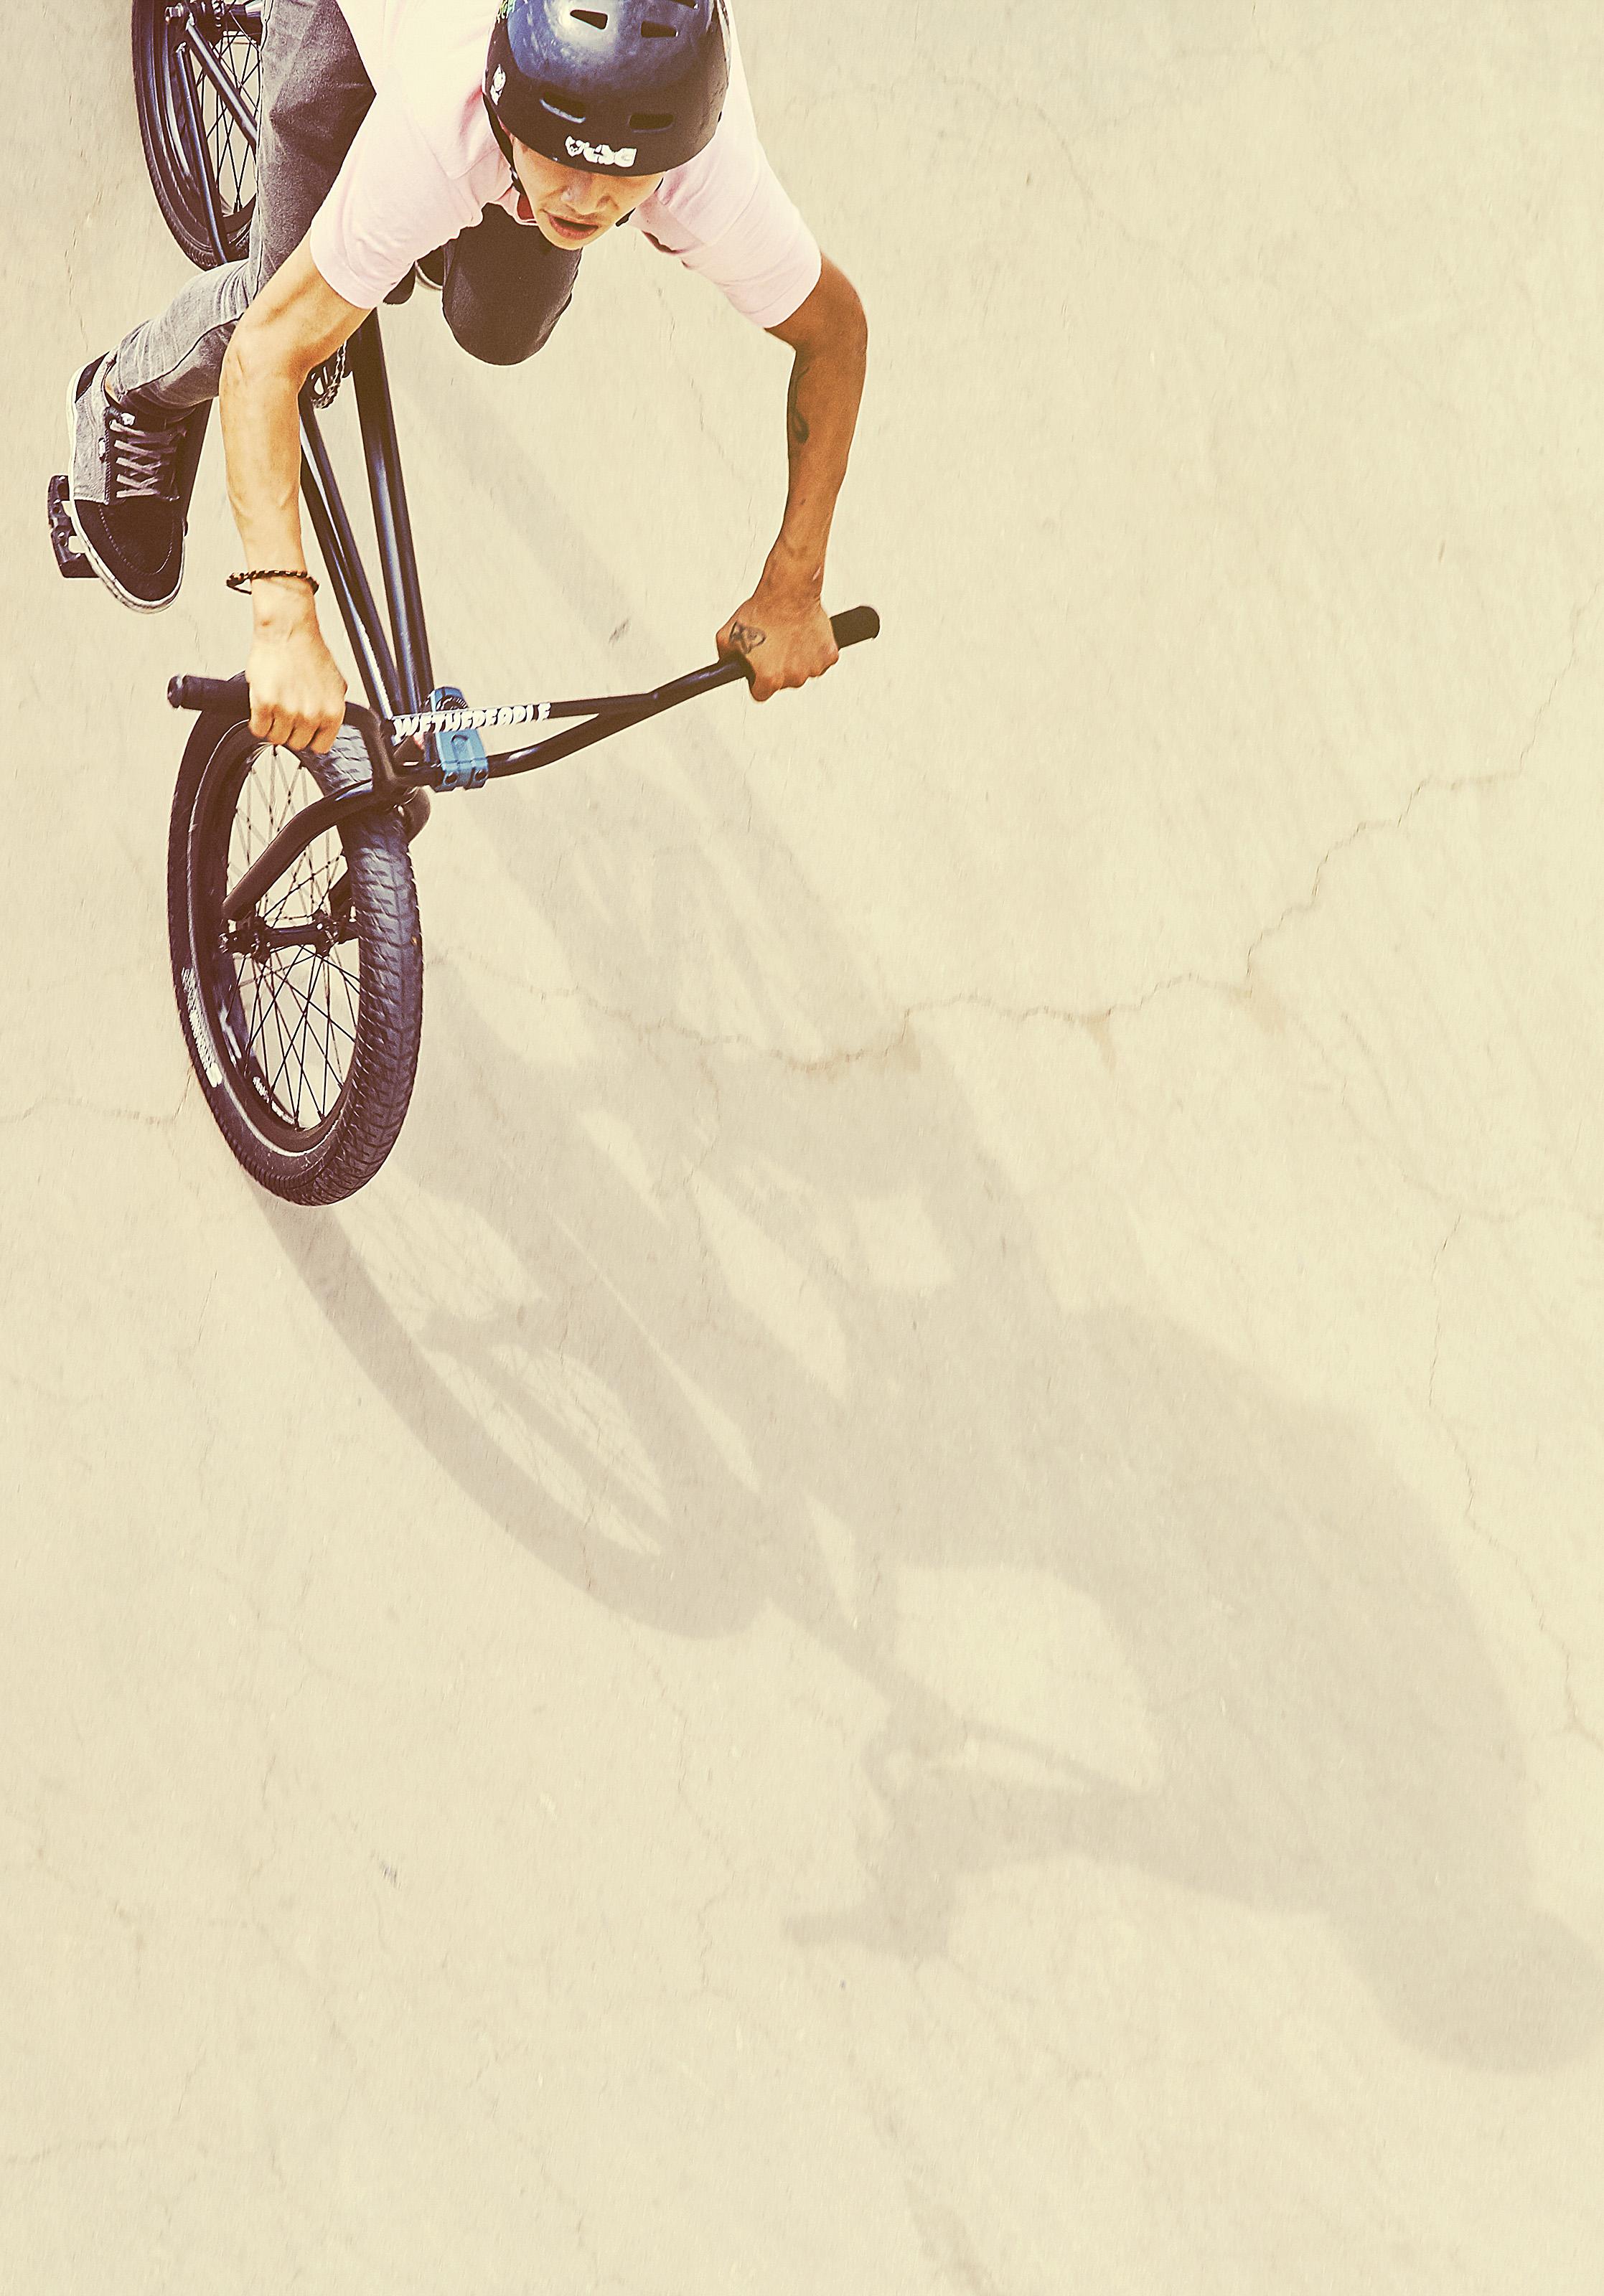 BMX rider on Barcelona beachfront